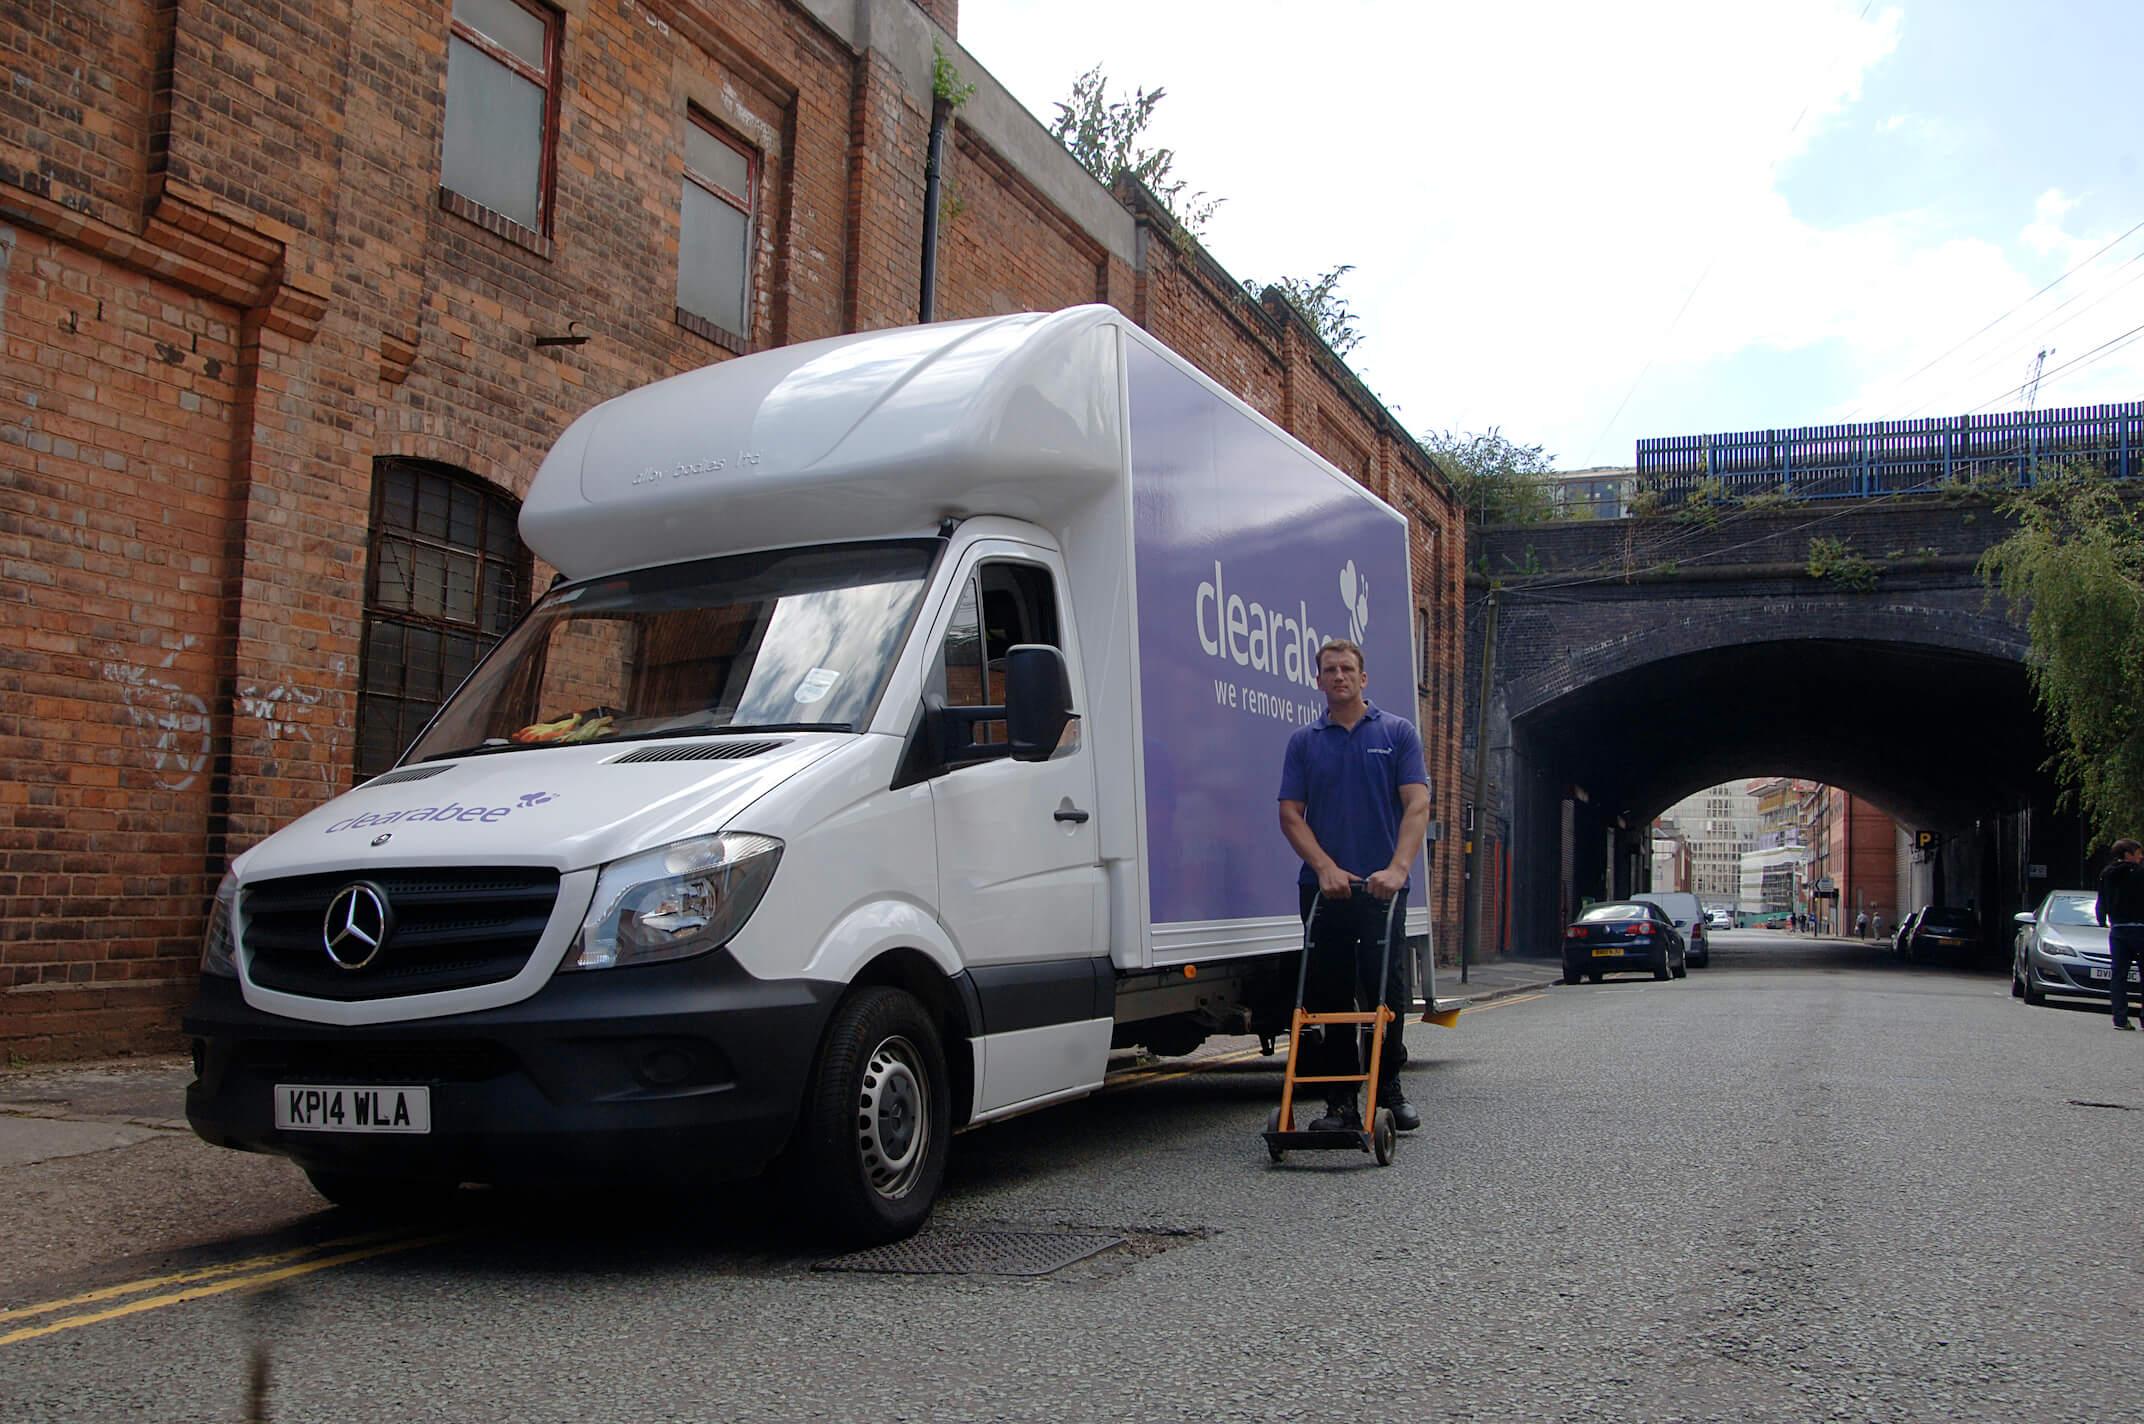 removal van on a roadside